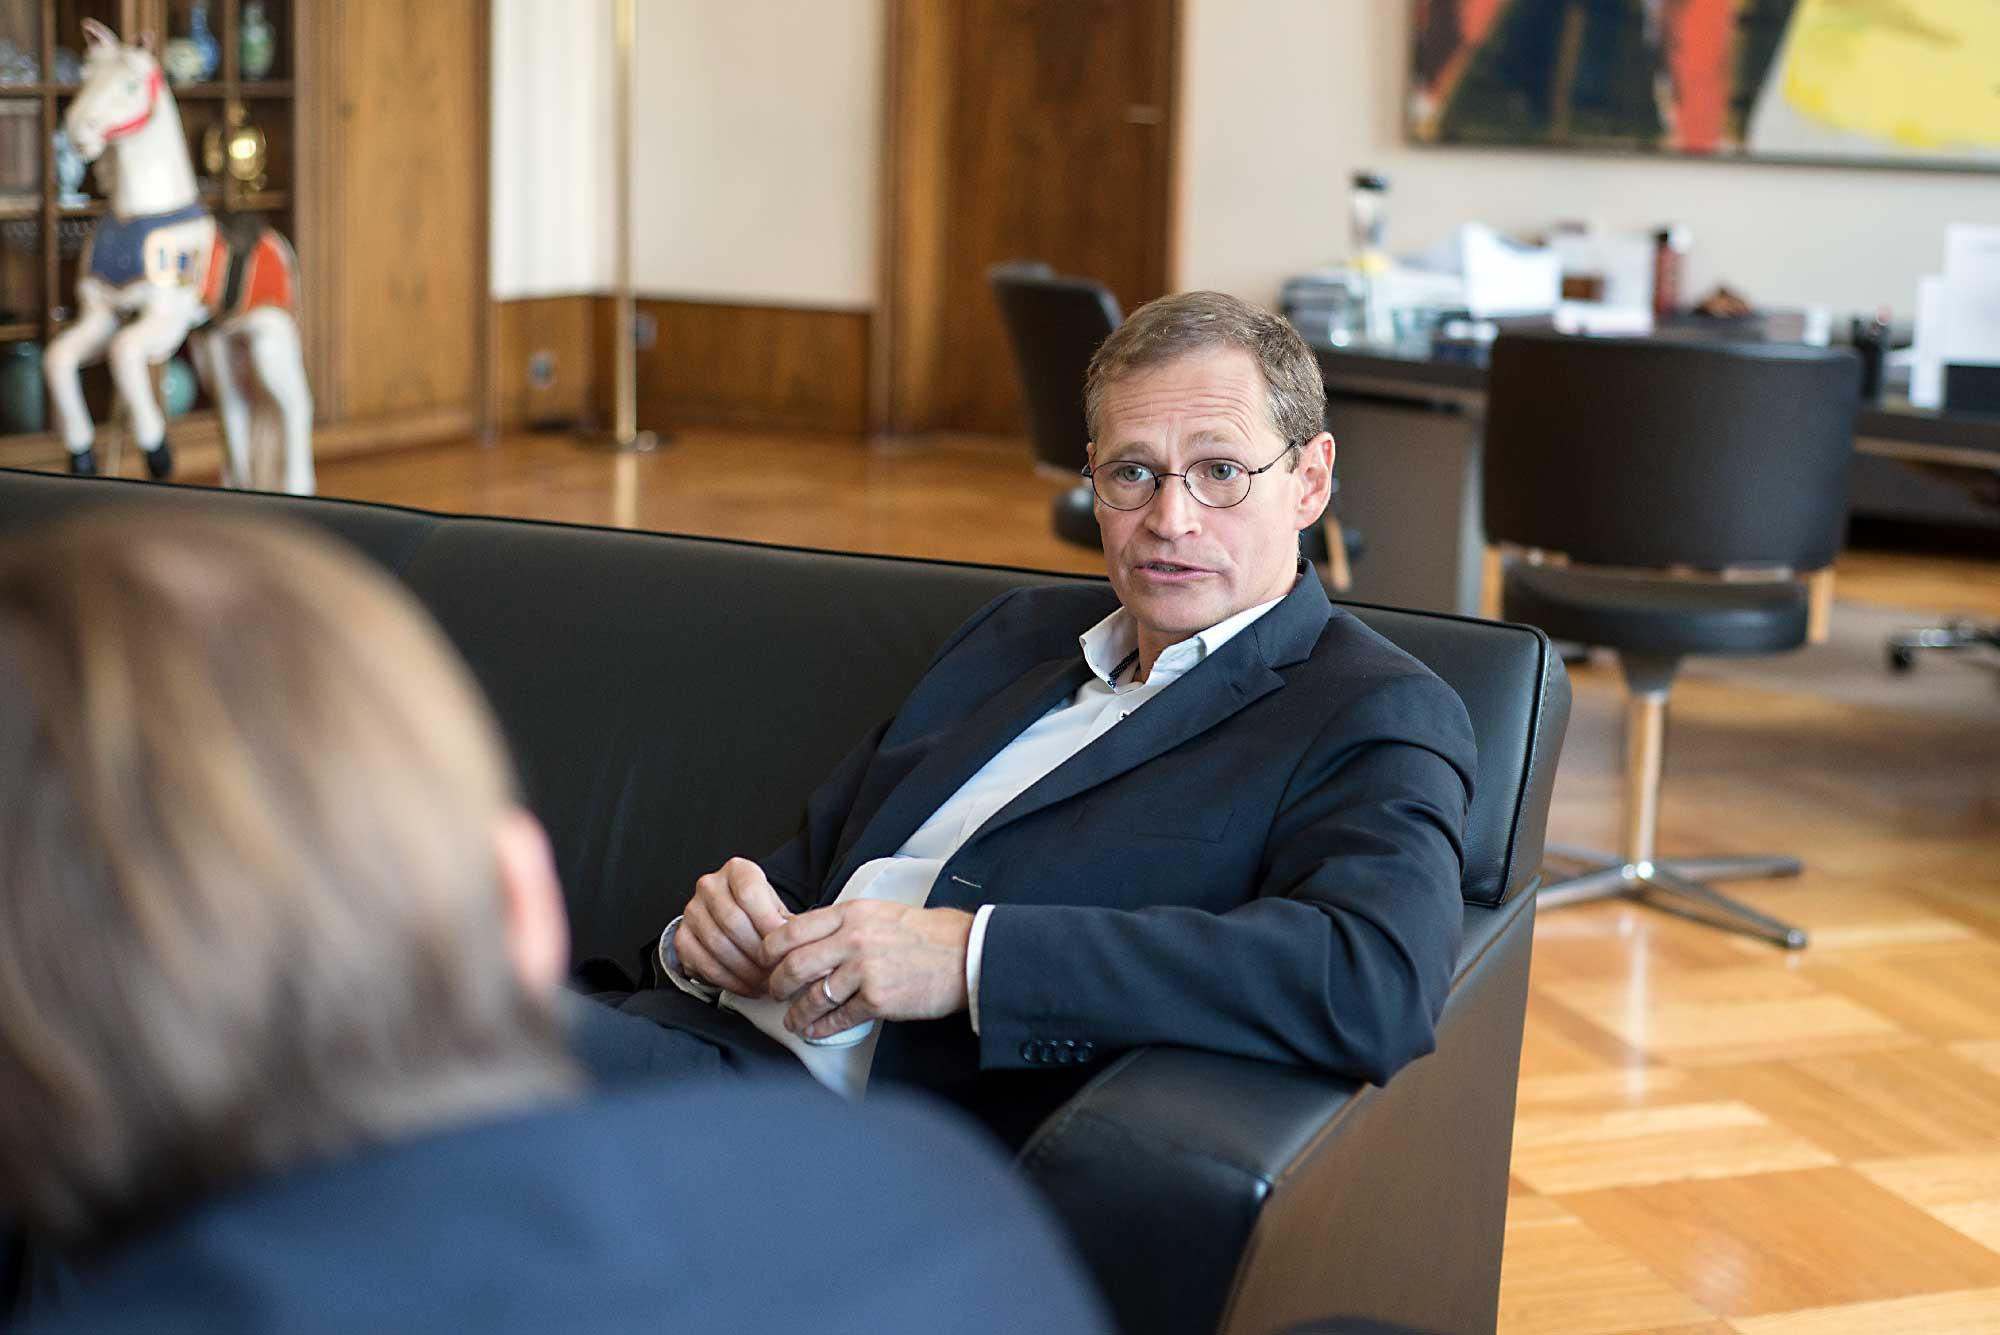 Berlins Regierender Bürgermeister im InterviewFoto: F. Anthea Schaap